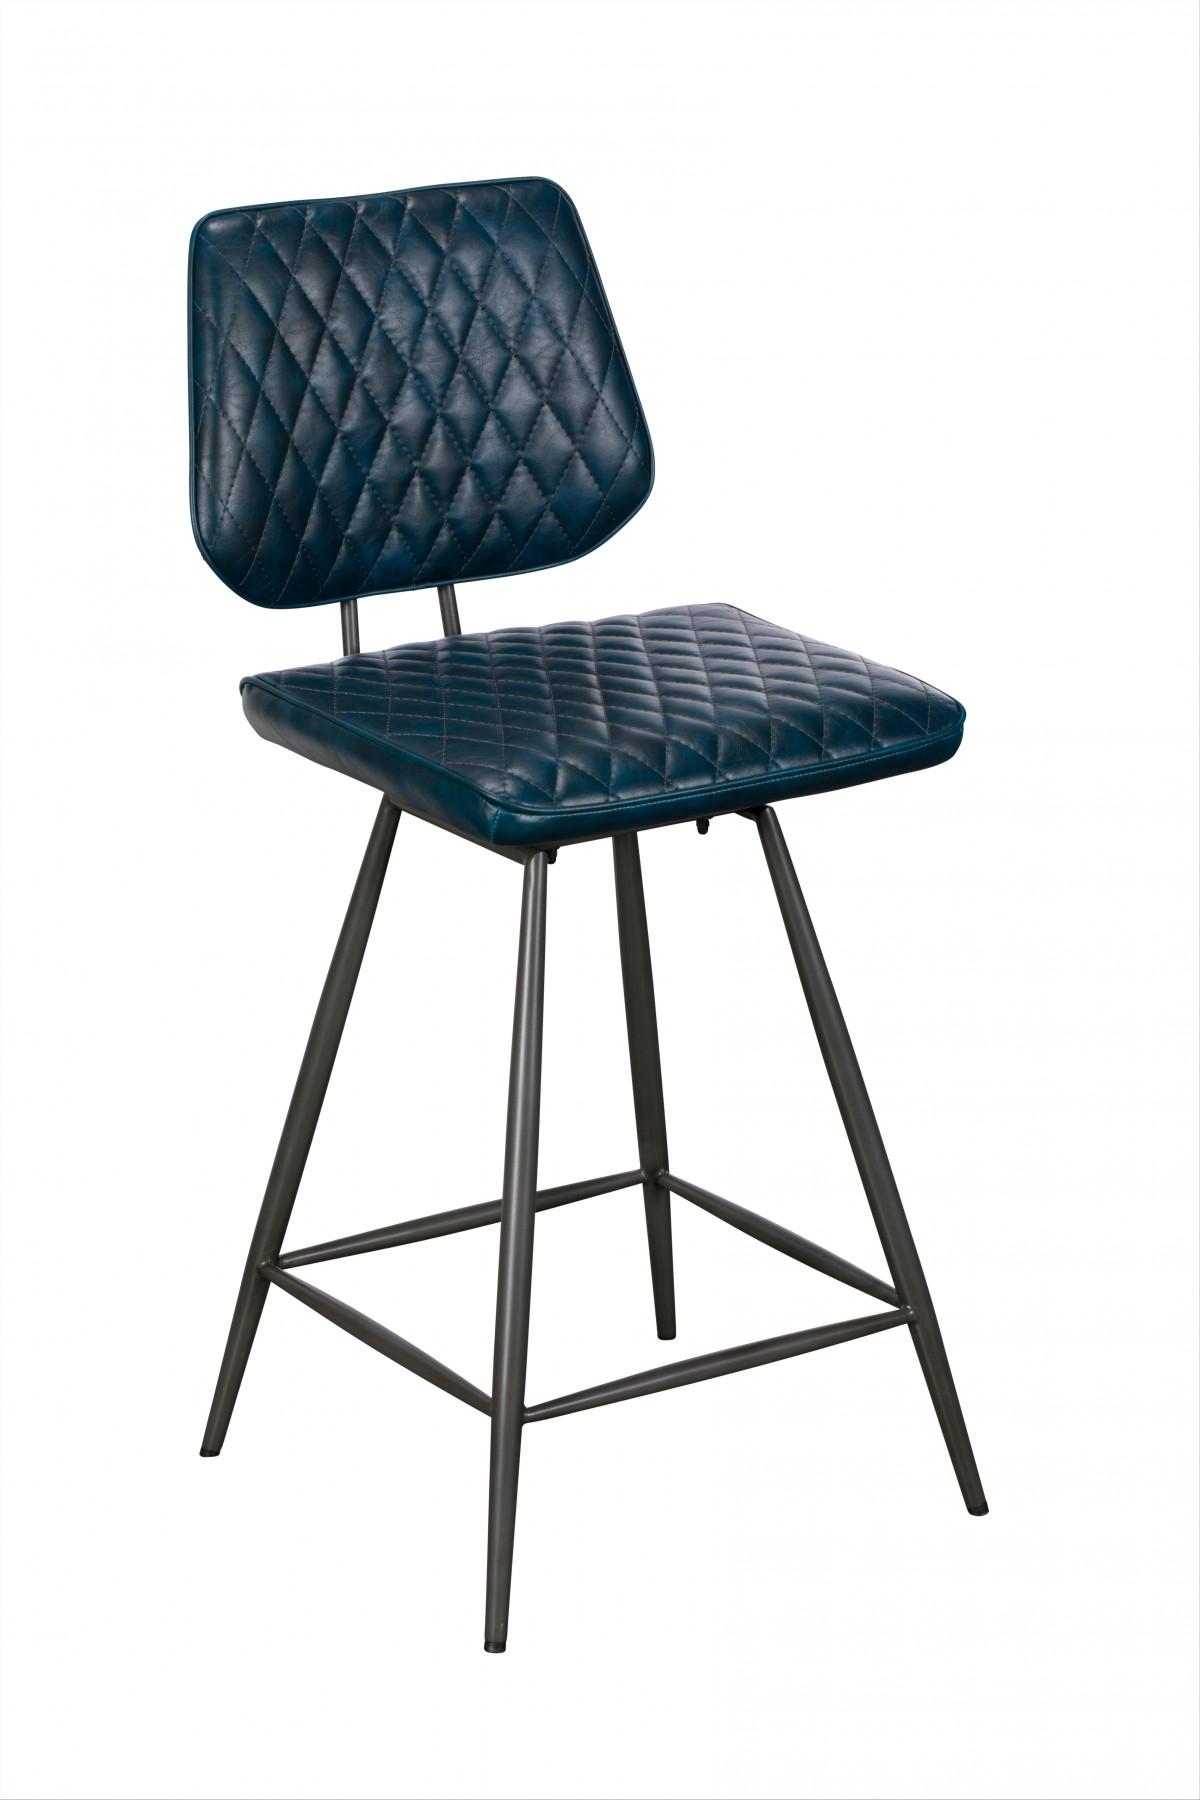 Ford Bar Table & 4 Blue Dalton Bar stools - Bundle Deal